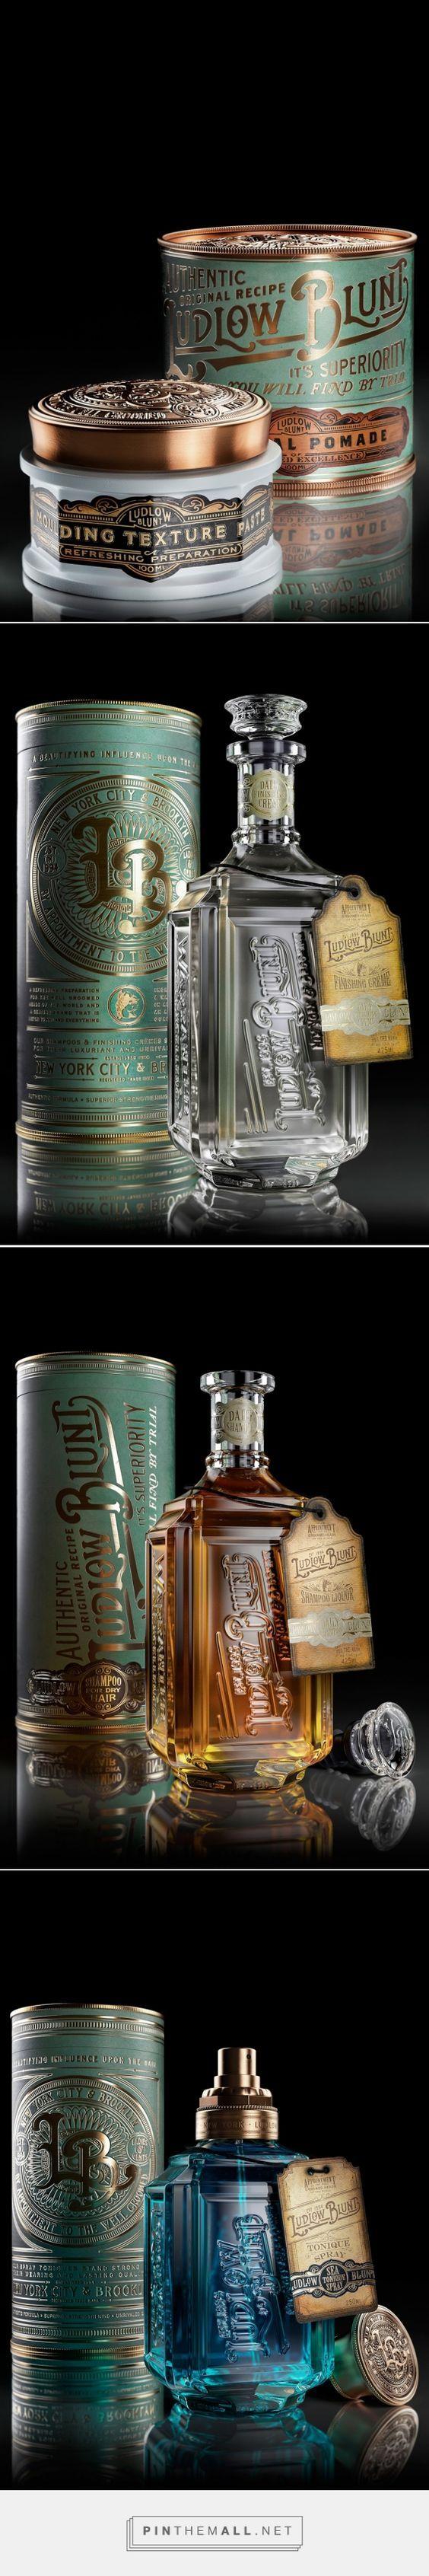 Ludlow Blunt Packaging by Stranger and Stranger | Fivestar Branding – Design and Branding Agency & Inspiration Gallery